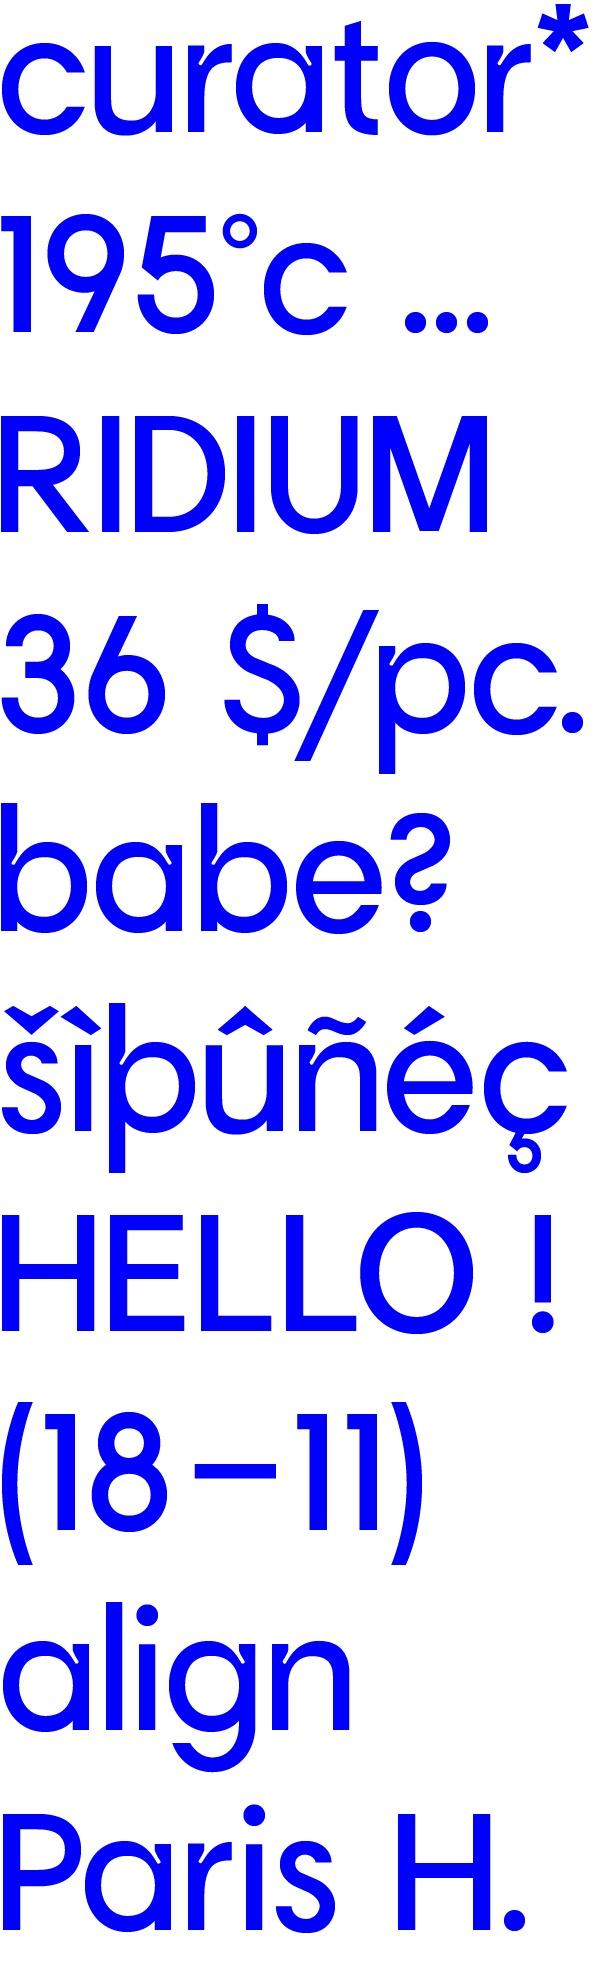 Curator Typeface —Engelbreckt